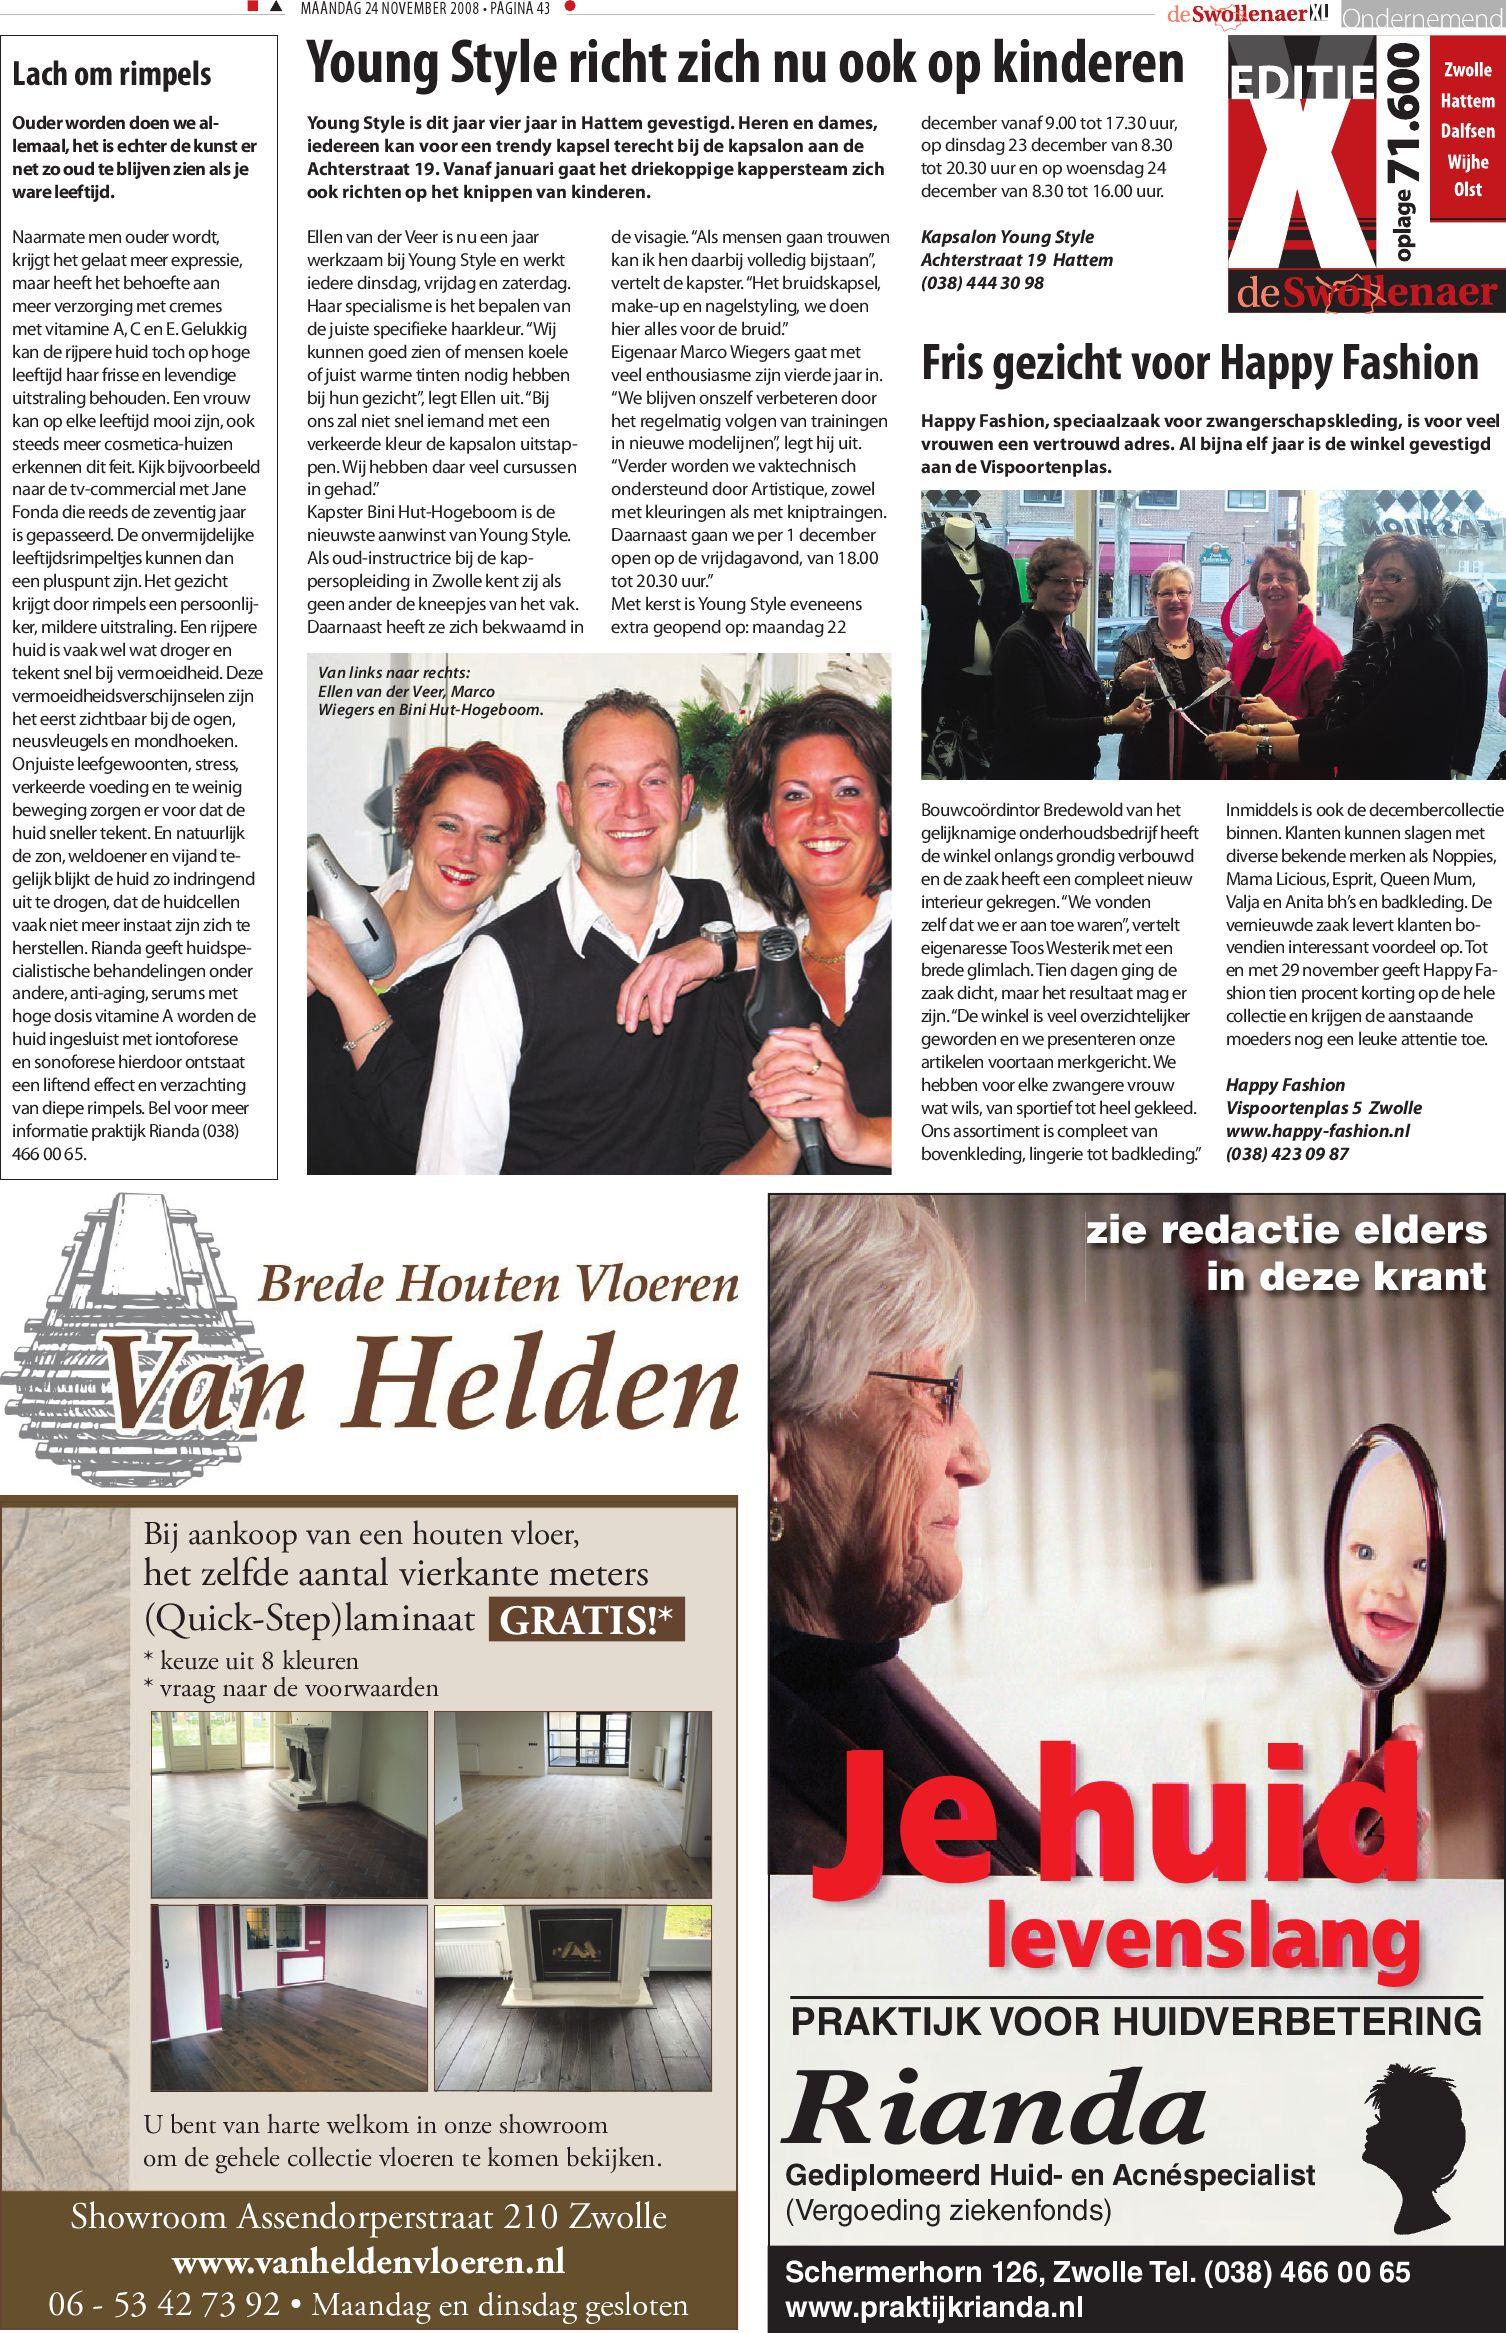 Zwangerschapskleding Zwolle.Swollenaer Week 48 By Brugmedia B V Issuu